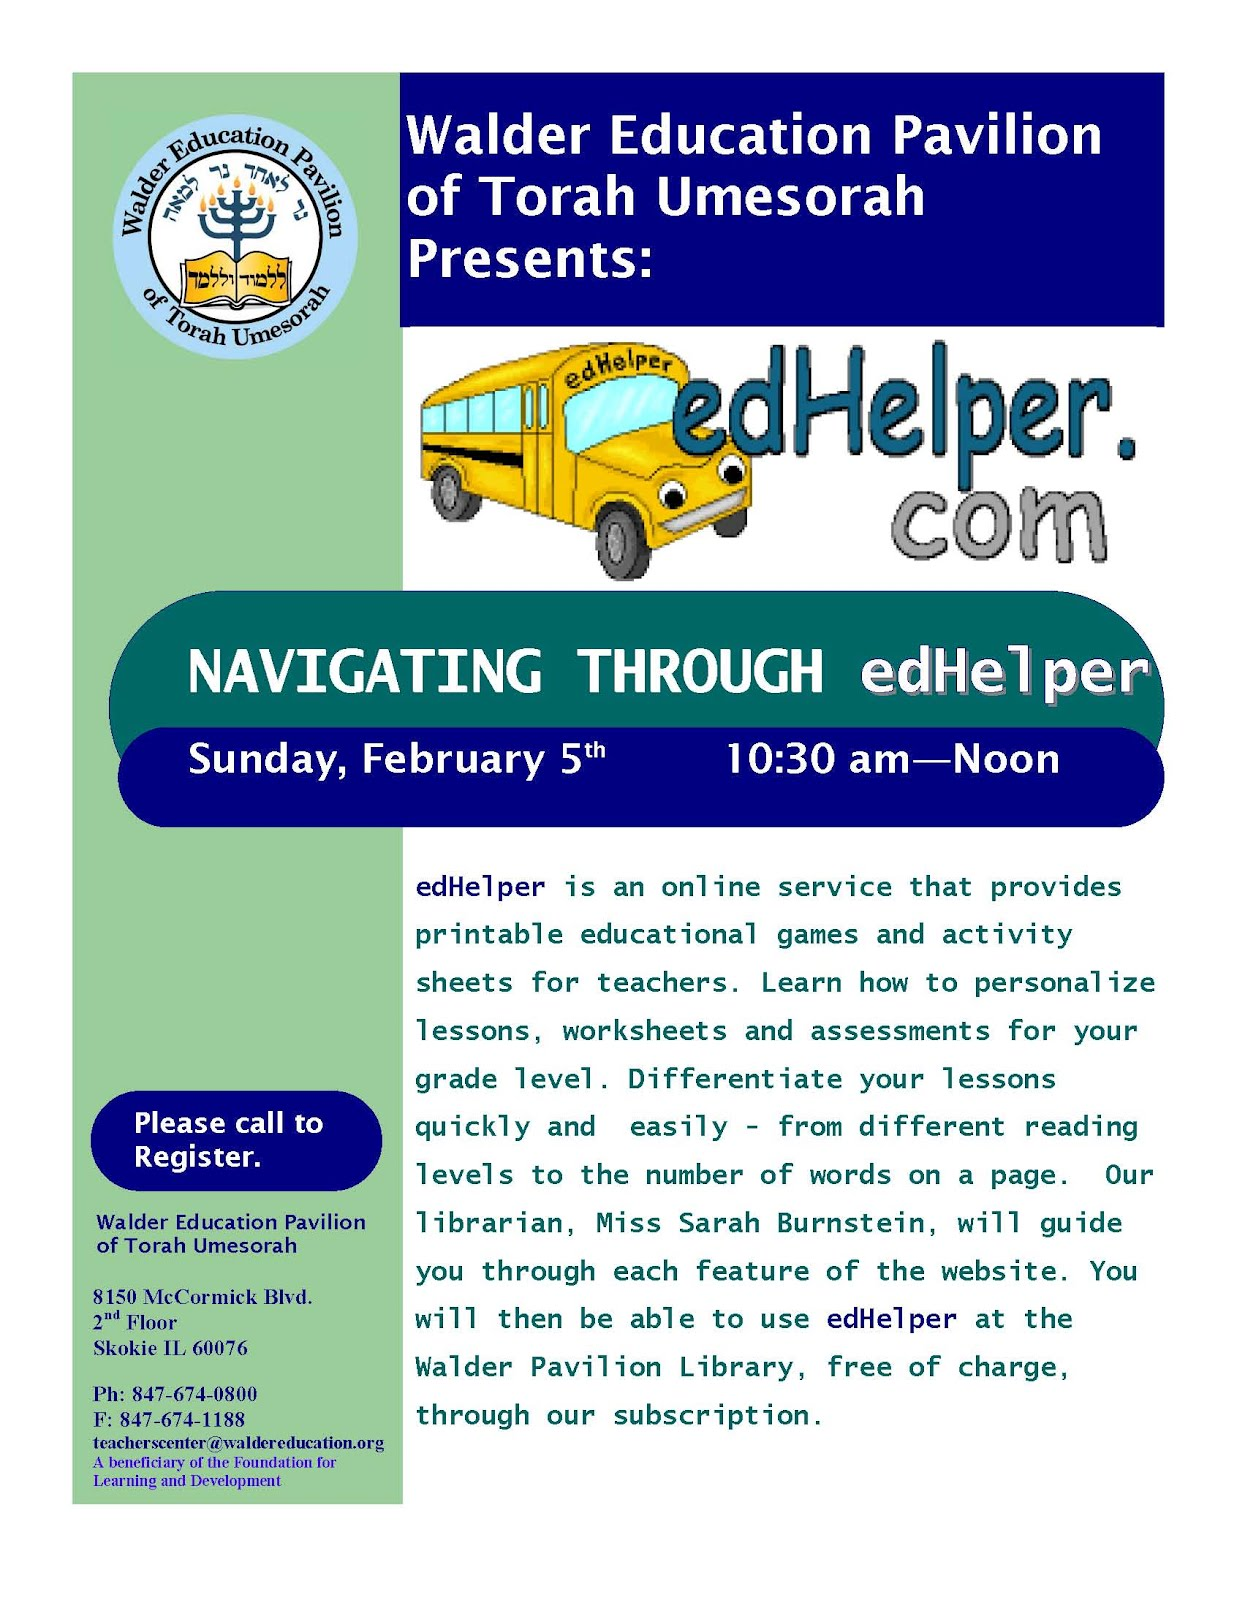 Worksheets Answers To Edhelper Worksheets walder education pavilion of torah umesorah february 2012 navigating through edhelper sunday 5th